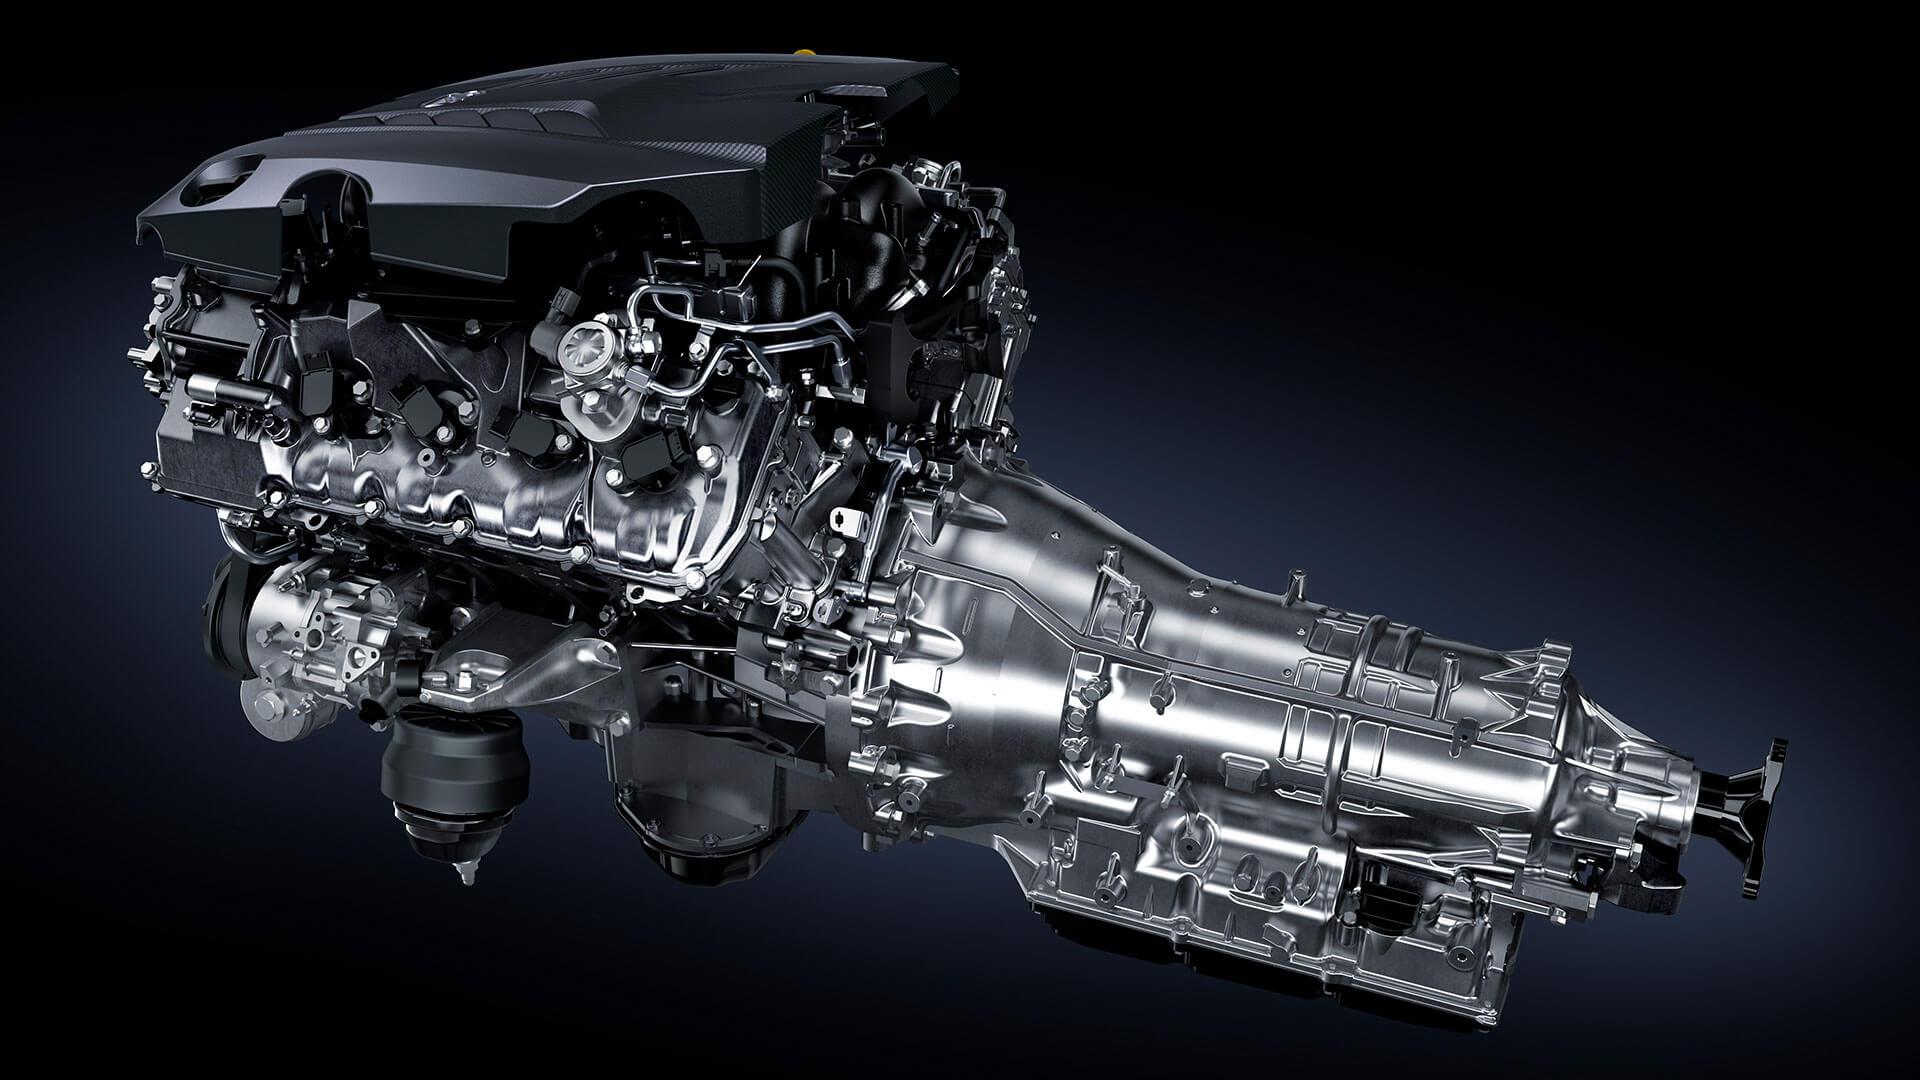 2017 lexus lc 500 features 10 speed transmission